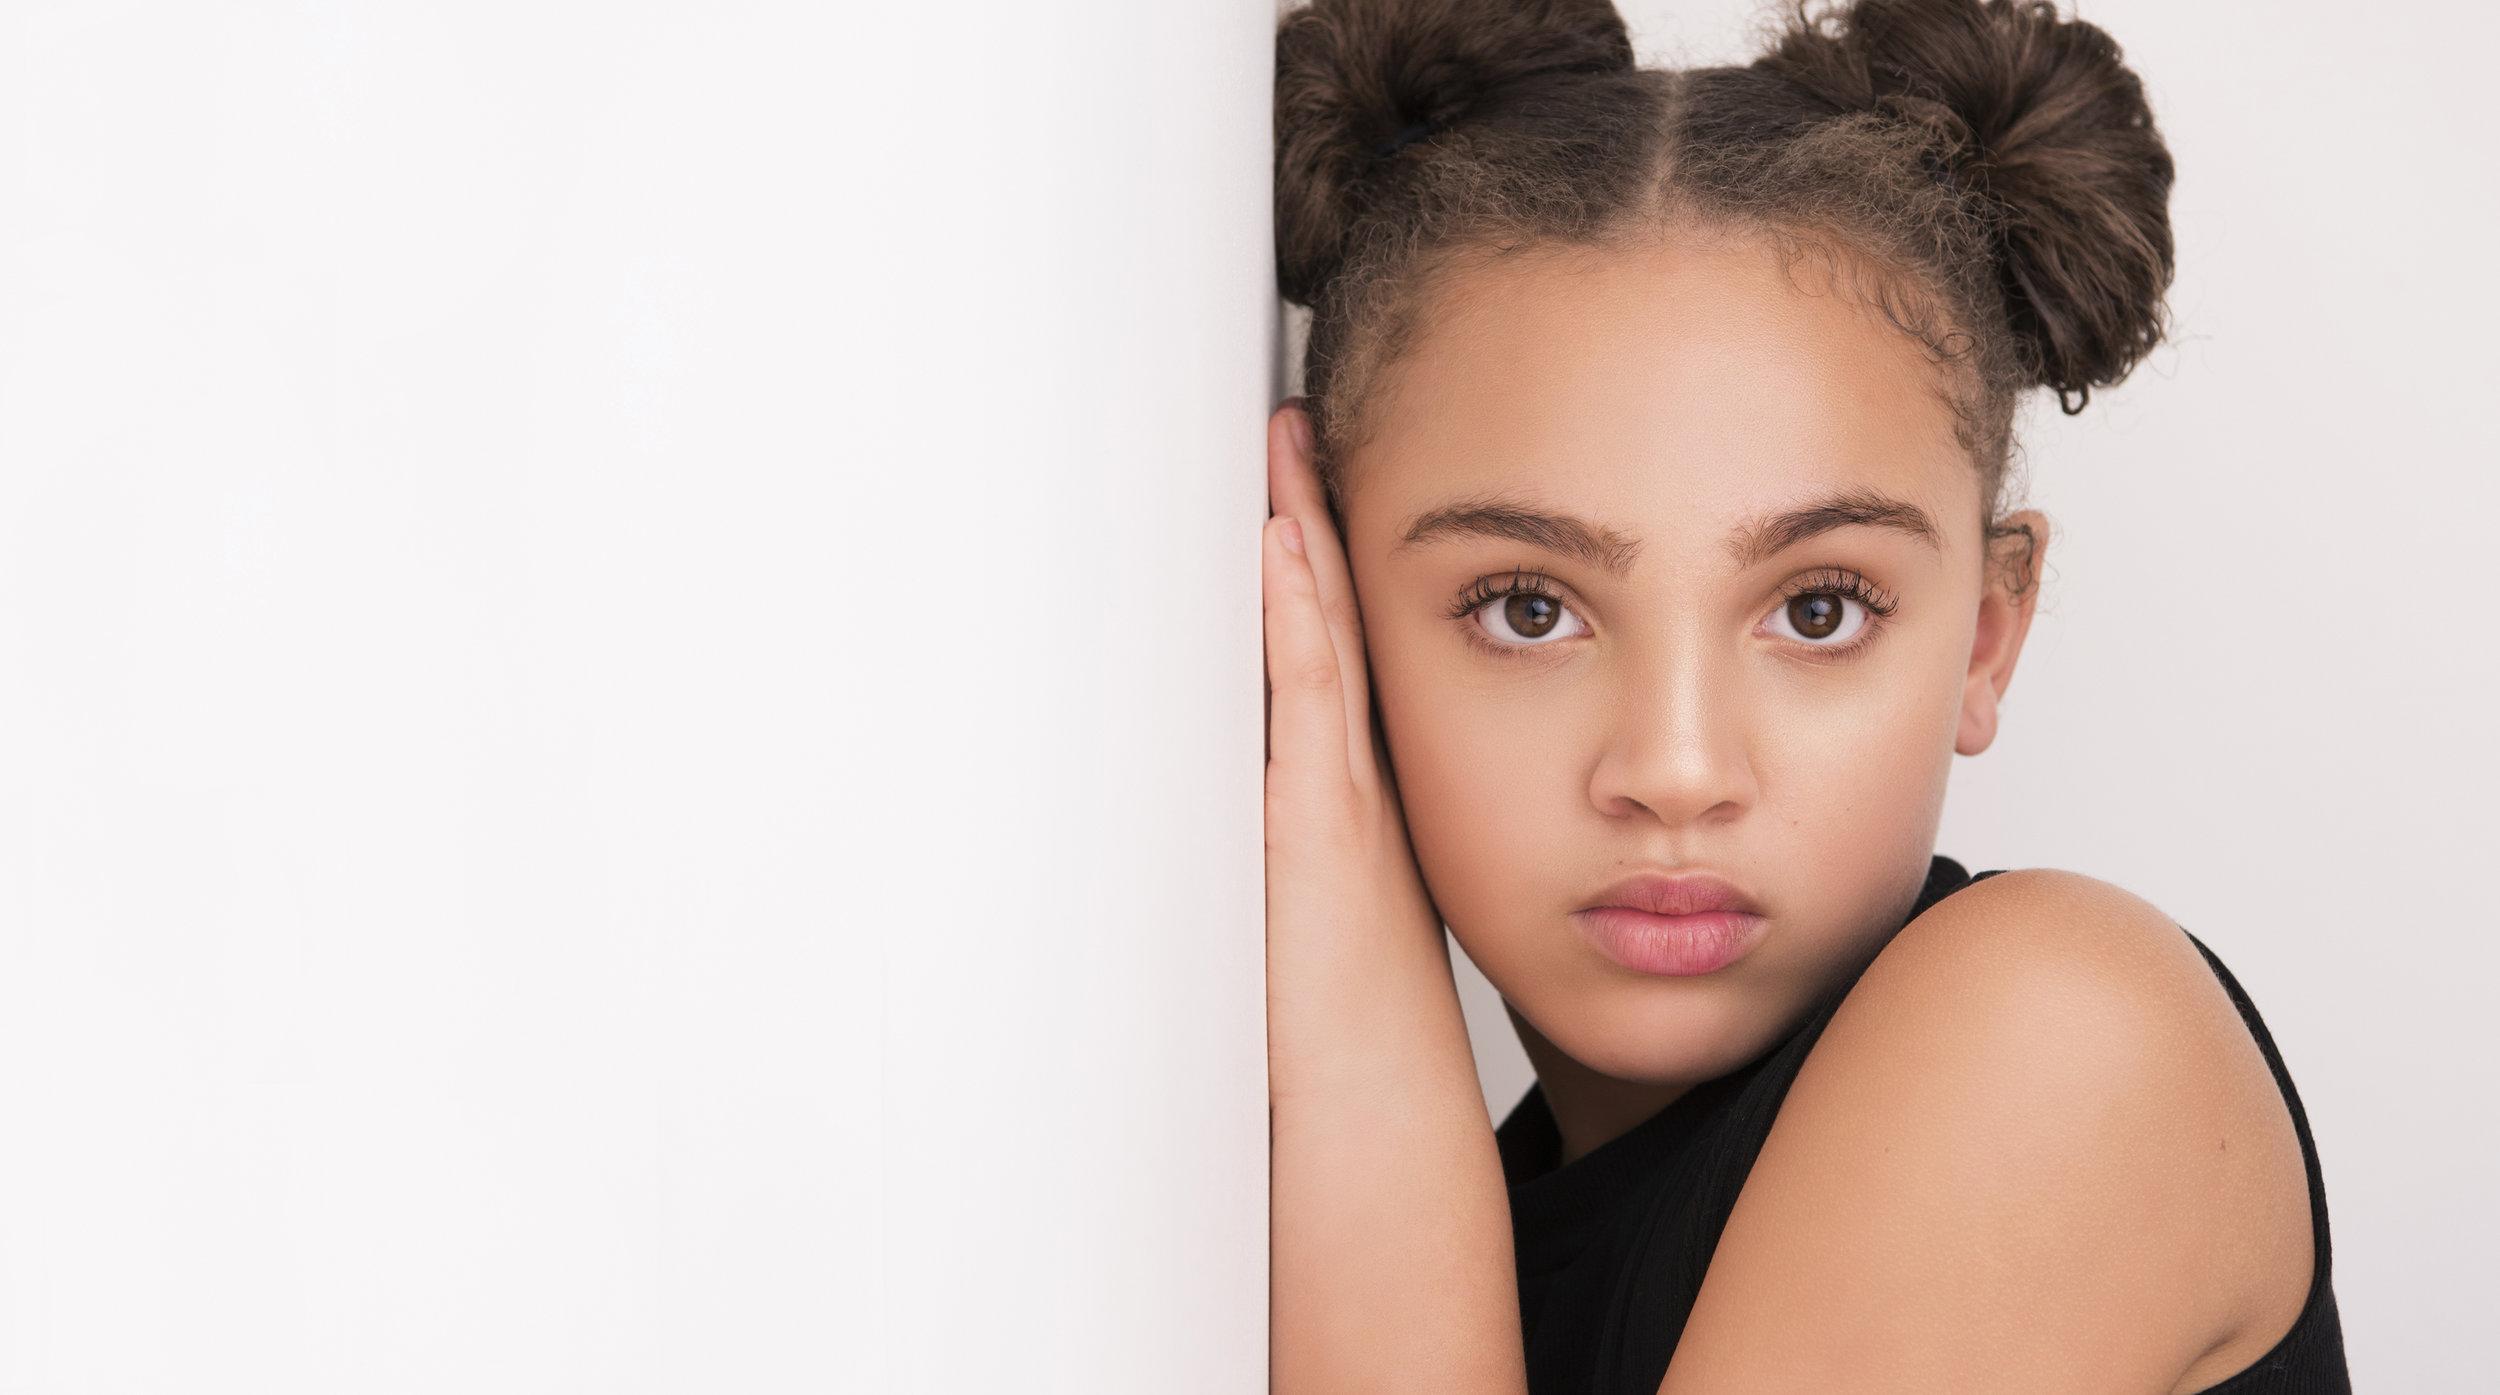 Child Portraits - Fresh & Modern Child Photography